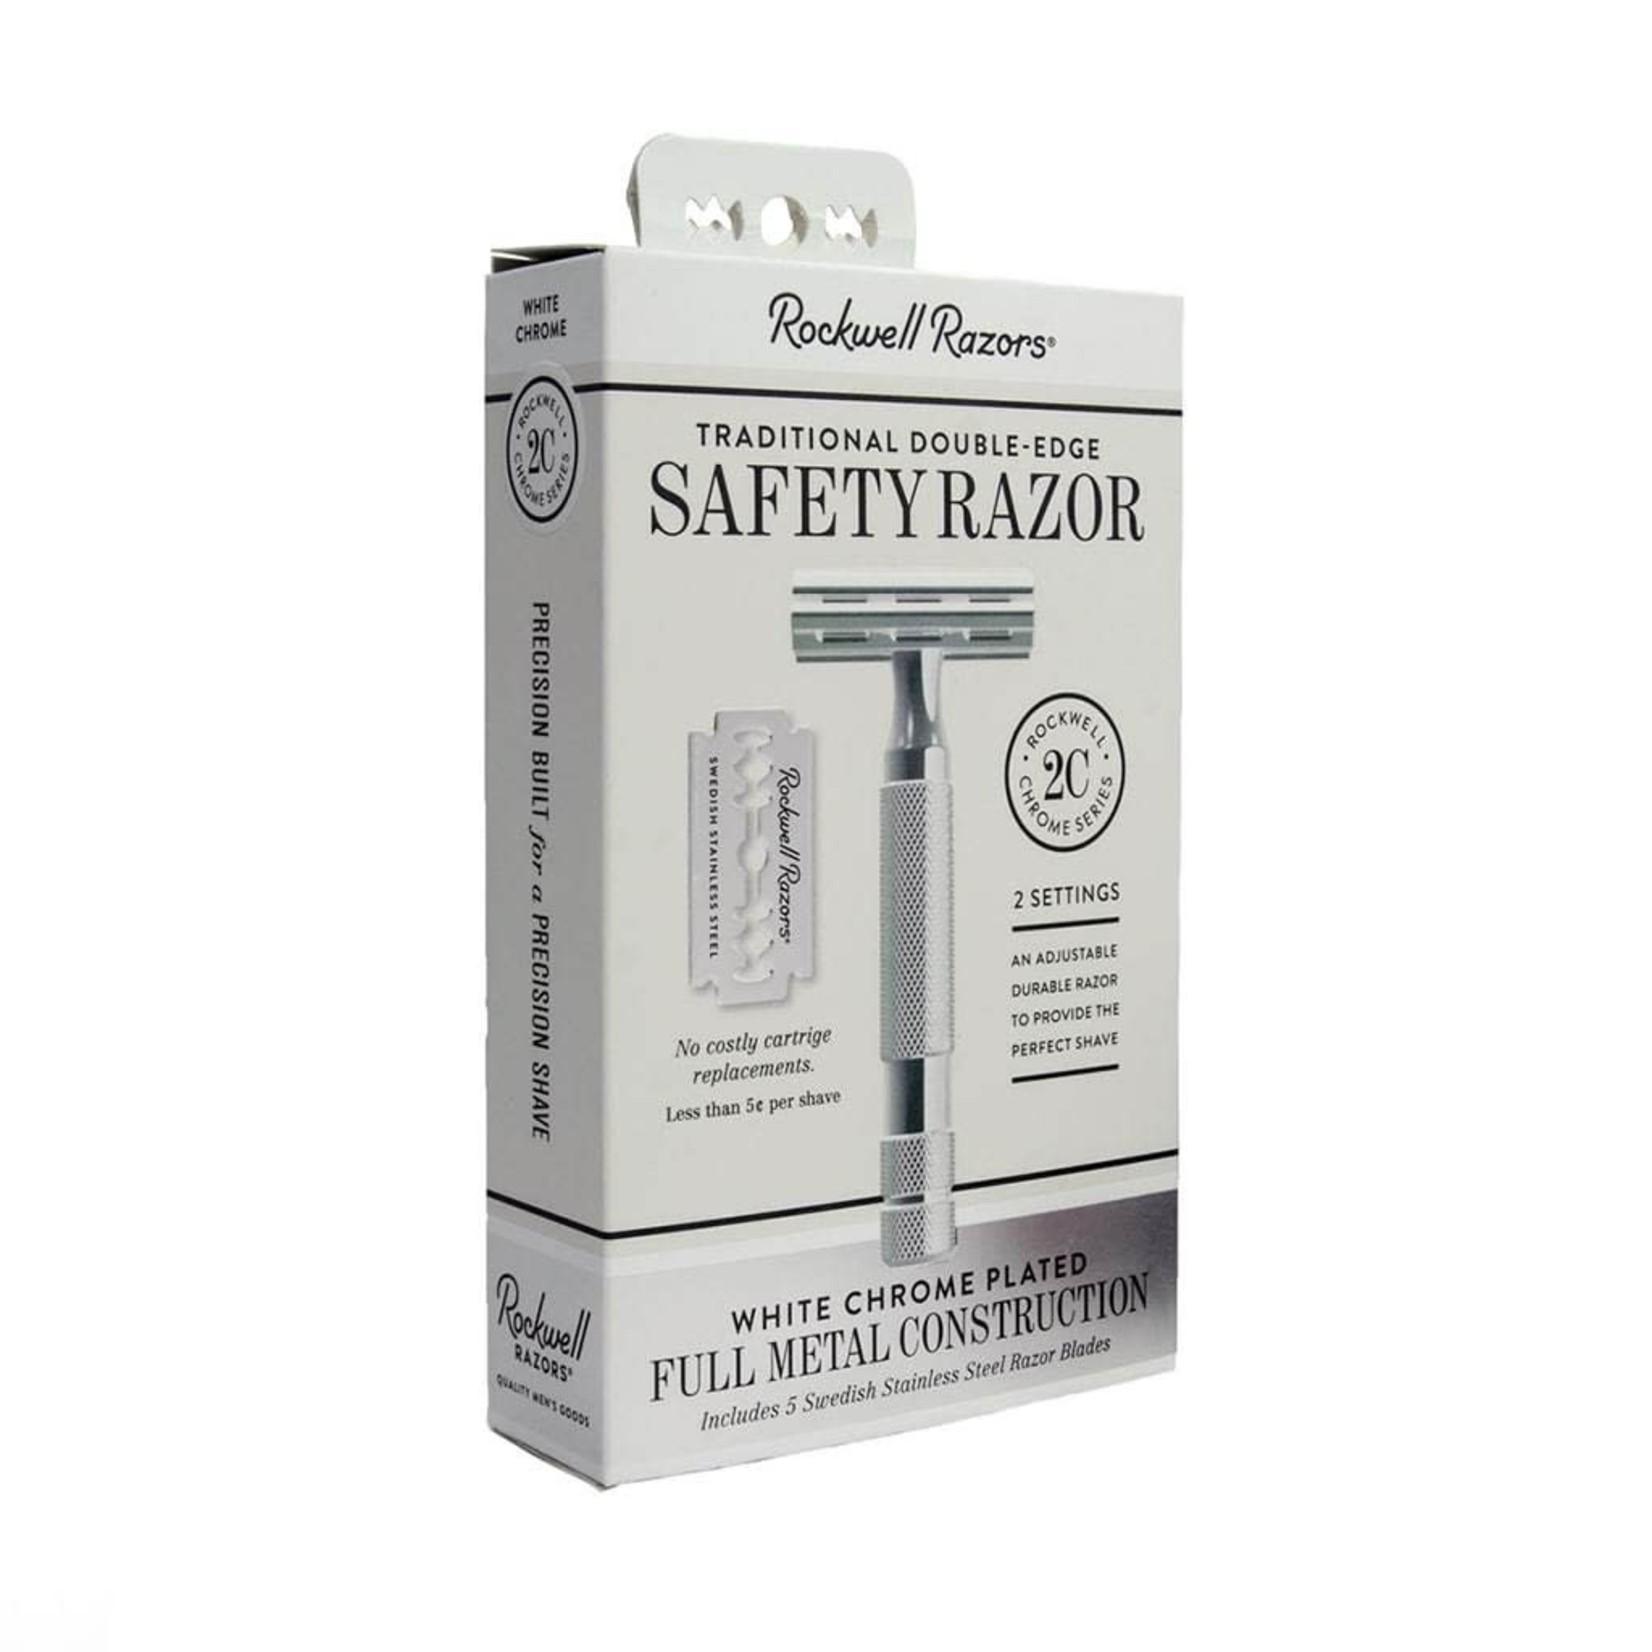 ROCKWELL RAZORS 2C DOUBLE EDGE SAFETY RAZOR